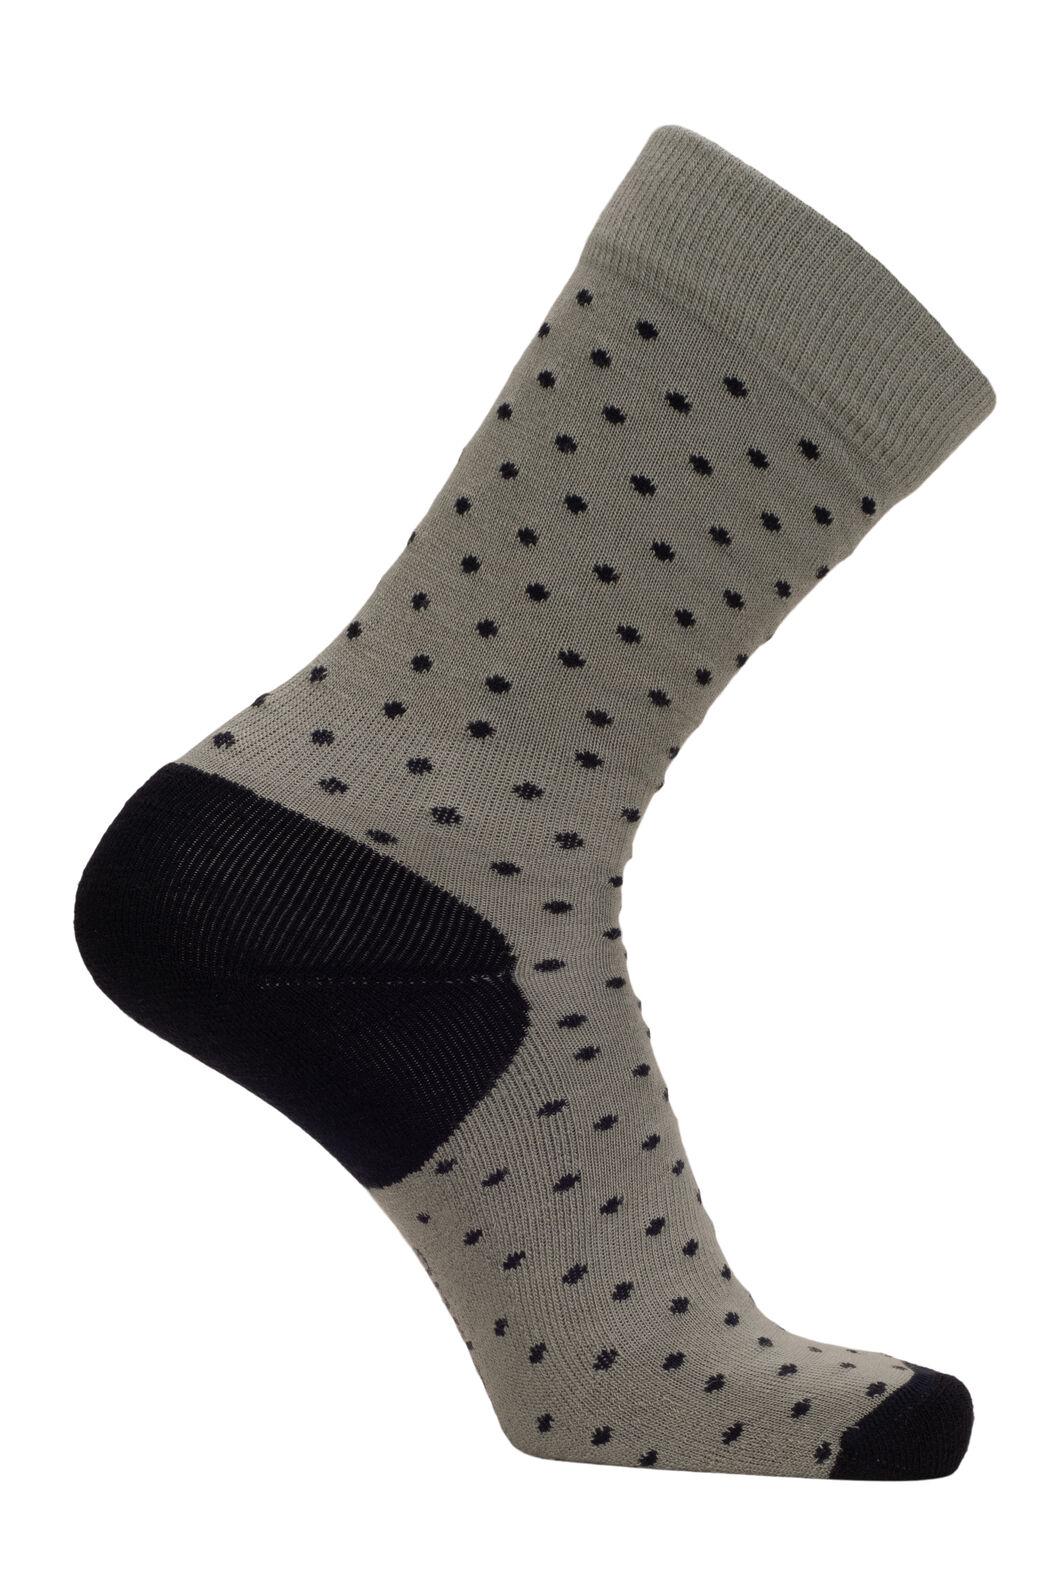 Macpac Merino Blend Footprint Socks, Green Bay Polka, hi-res